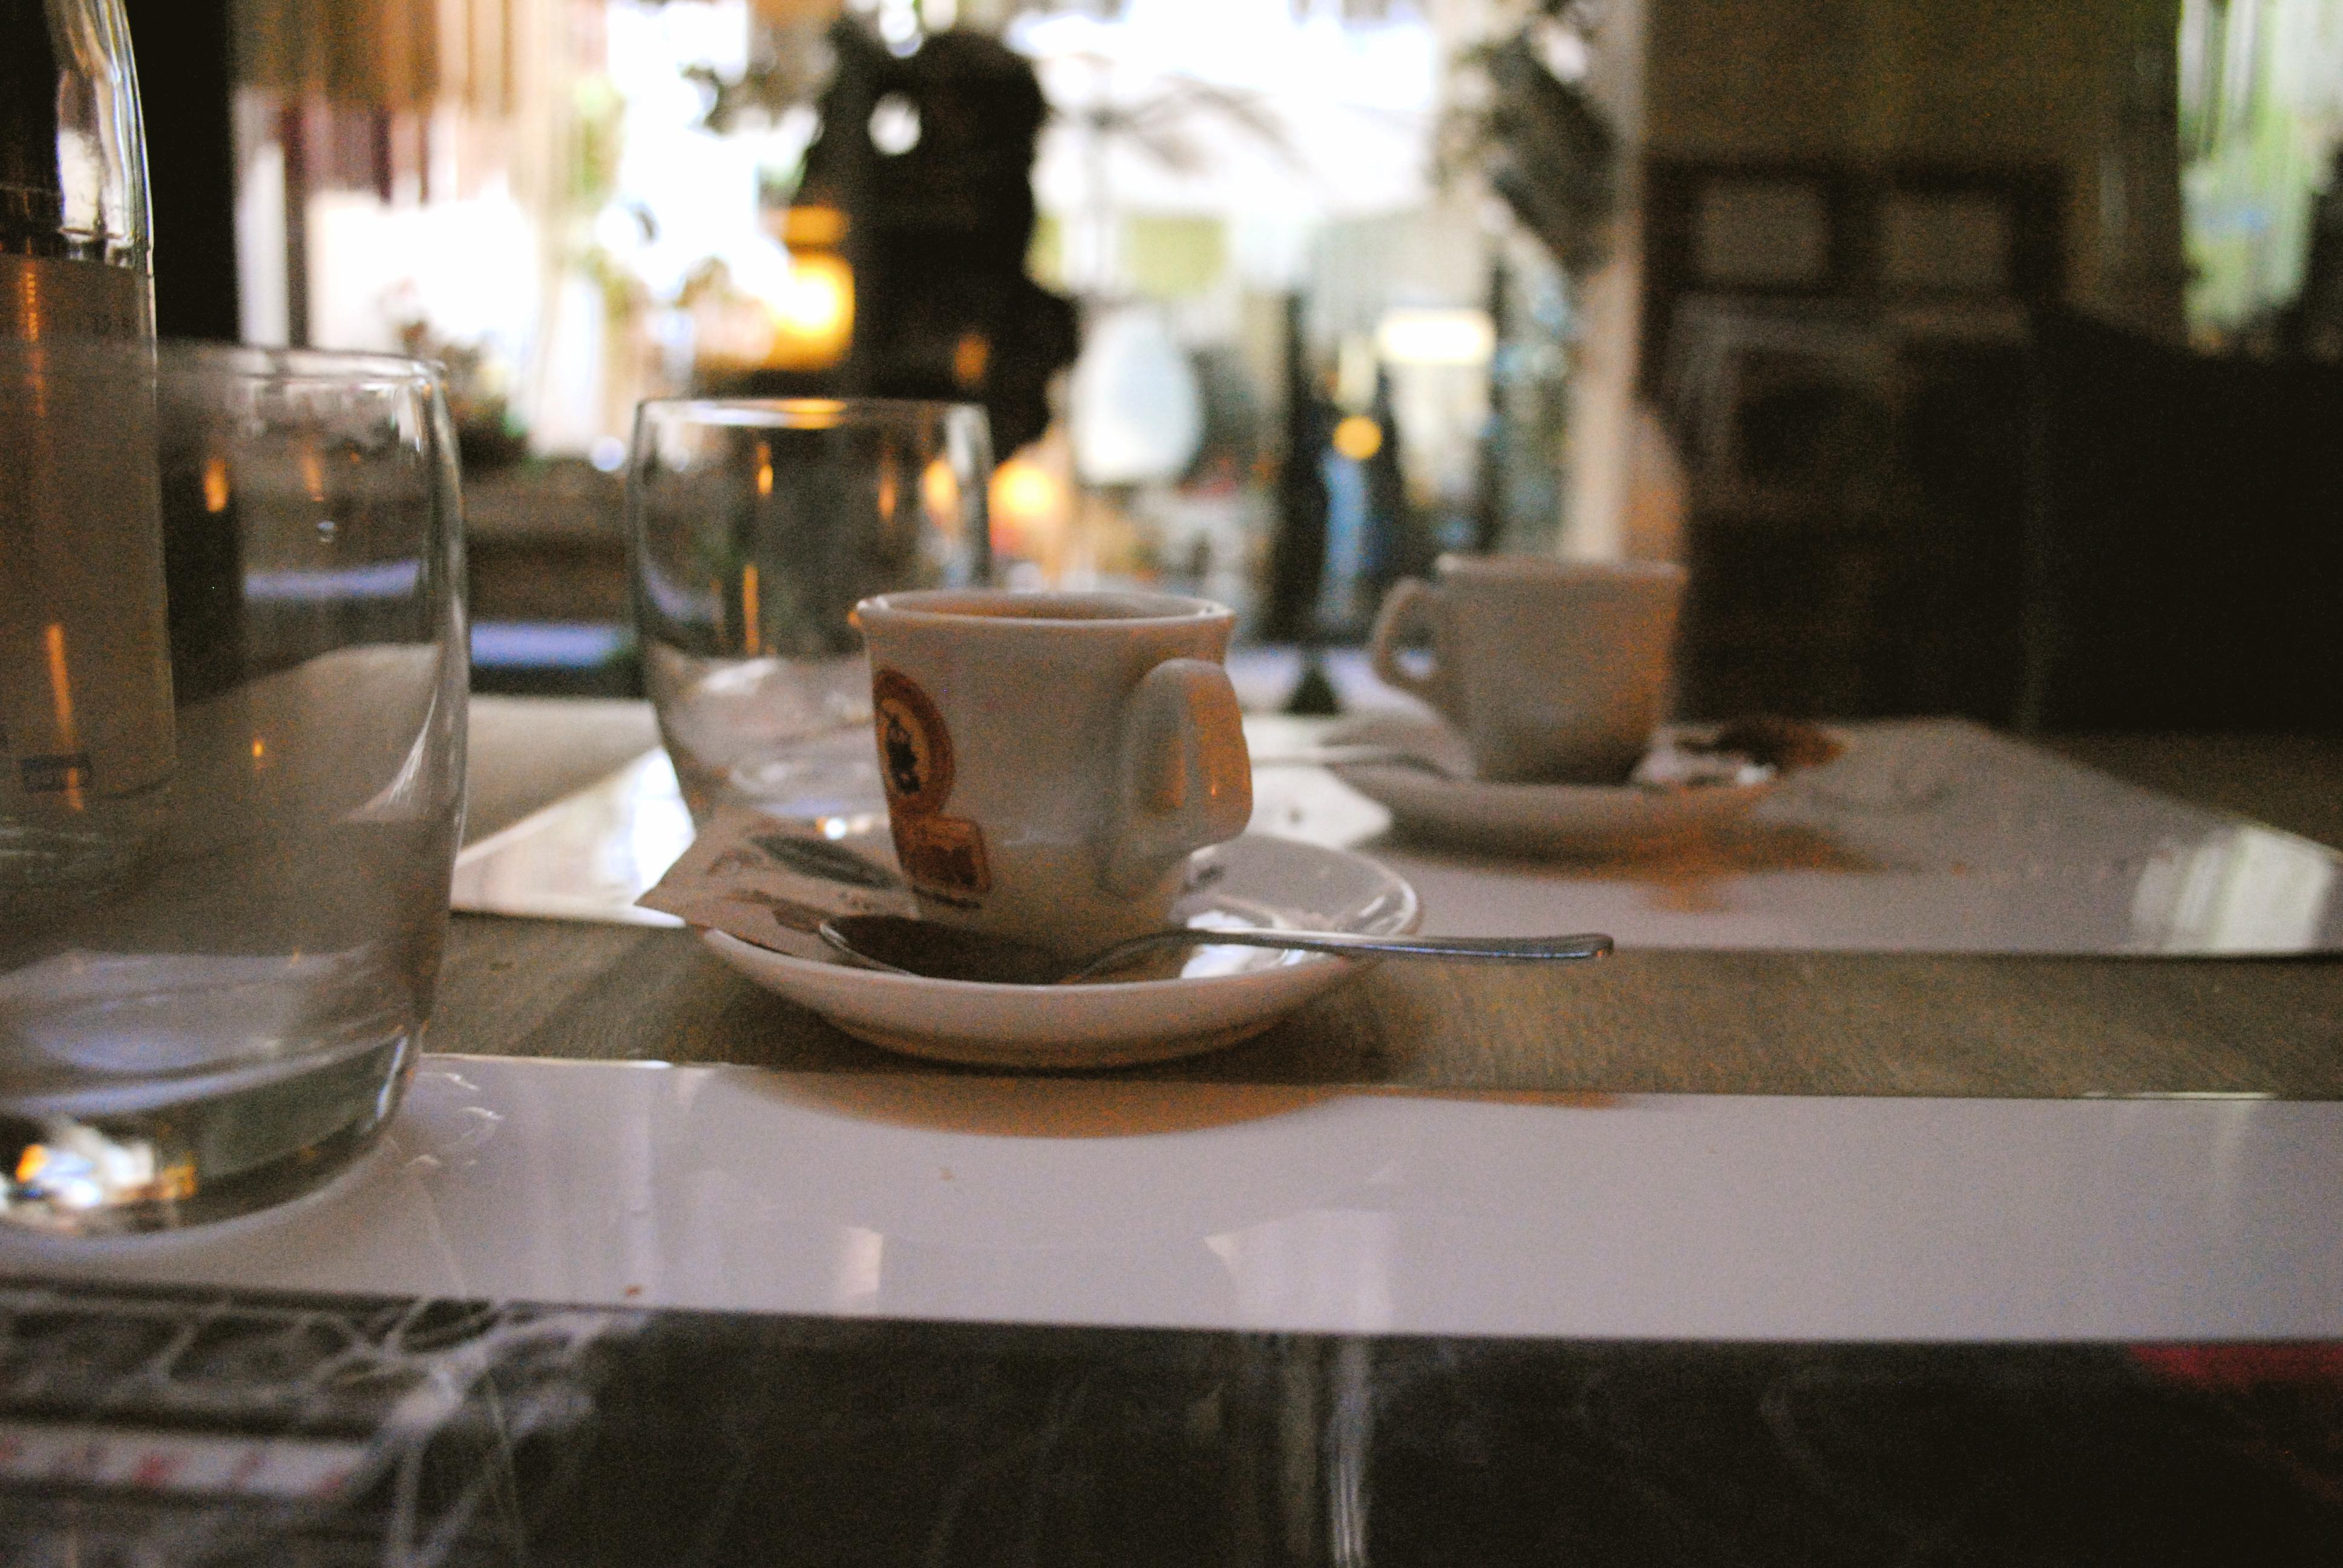 Espresso. Florence, Italy.